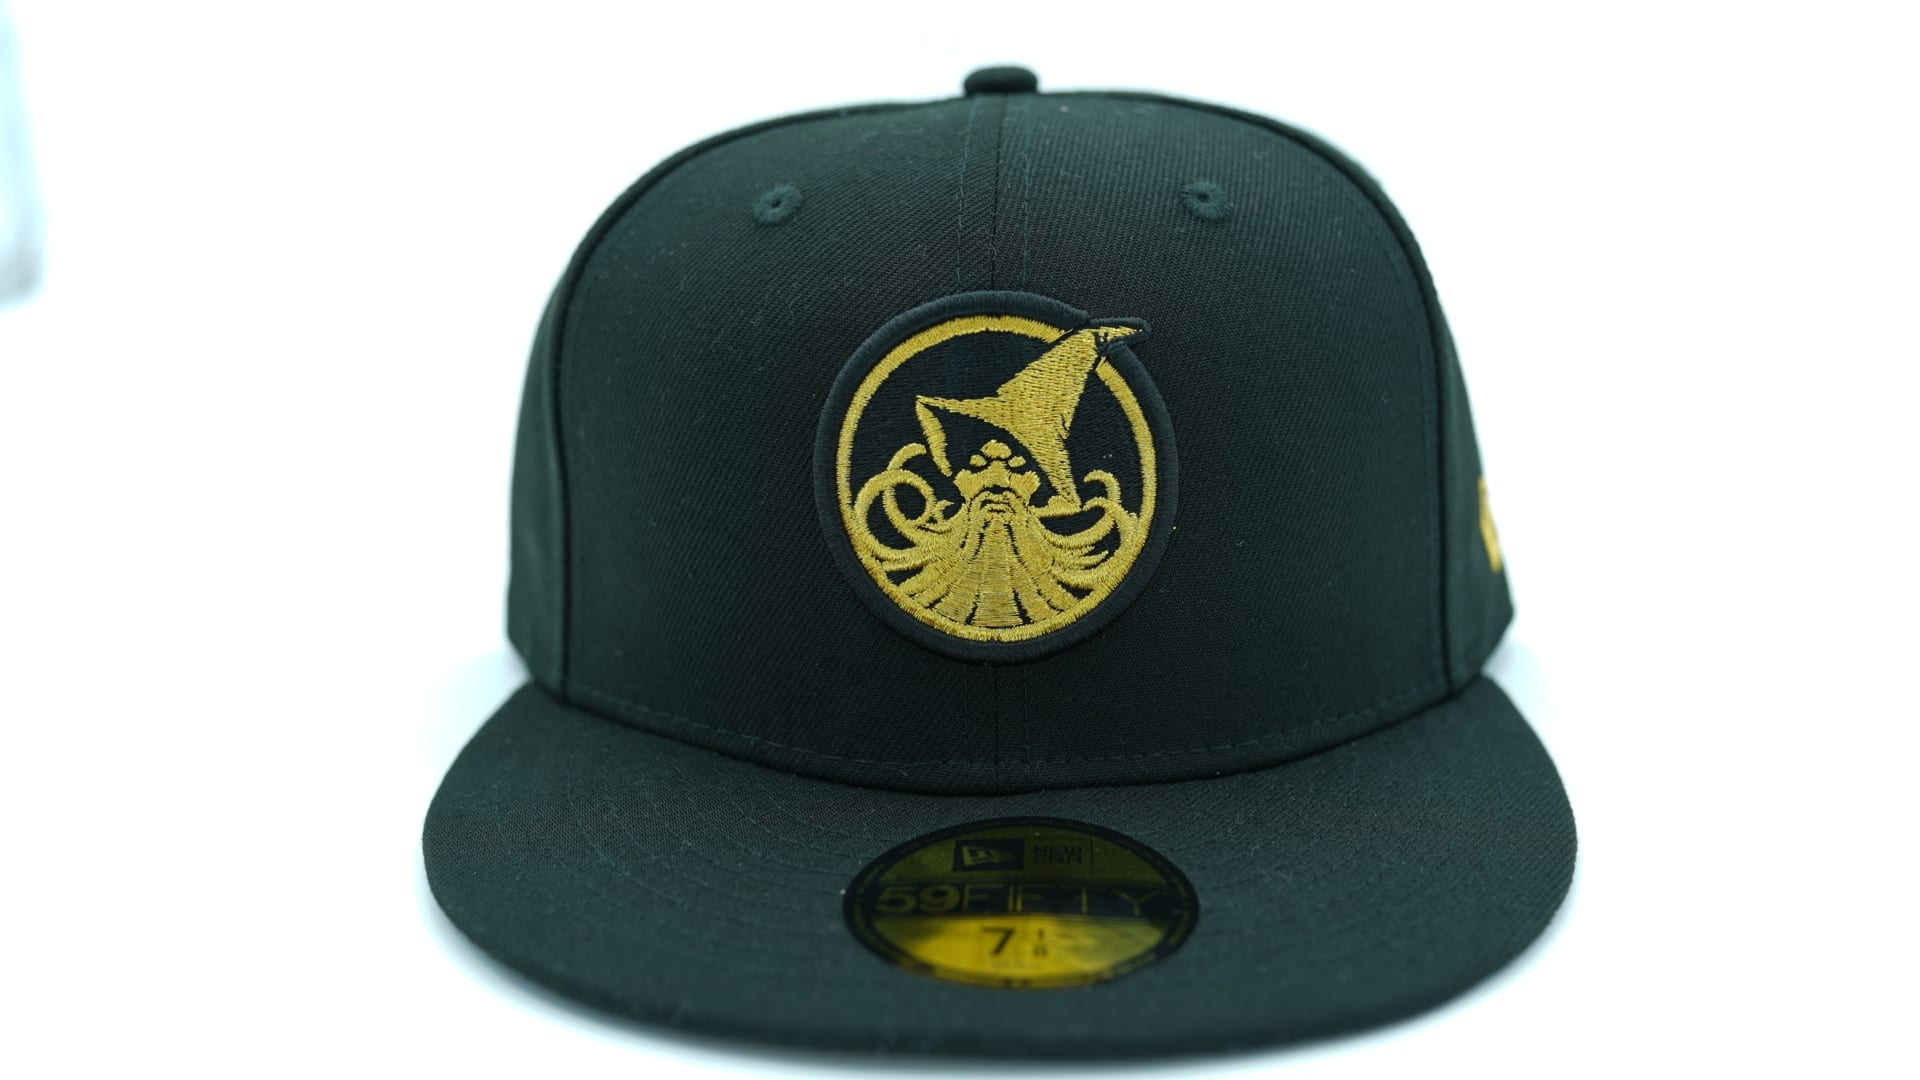 new-era-by-you-sneak-preview-cap-hat- 6e2fe66d659f